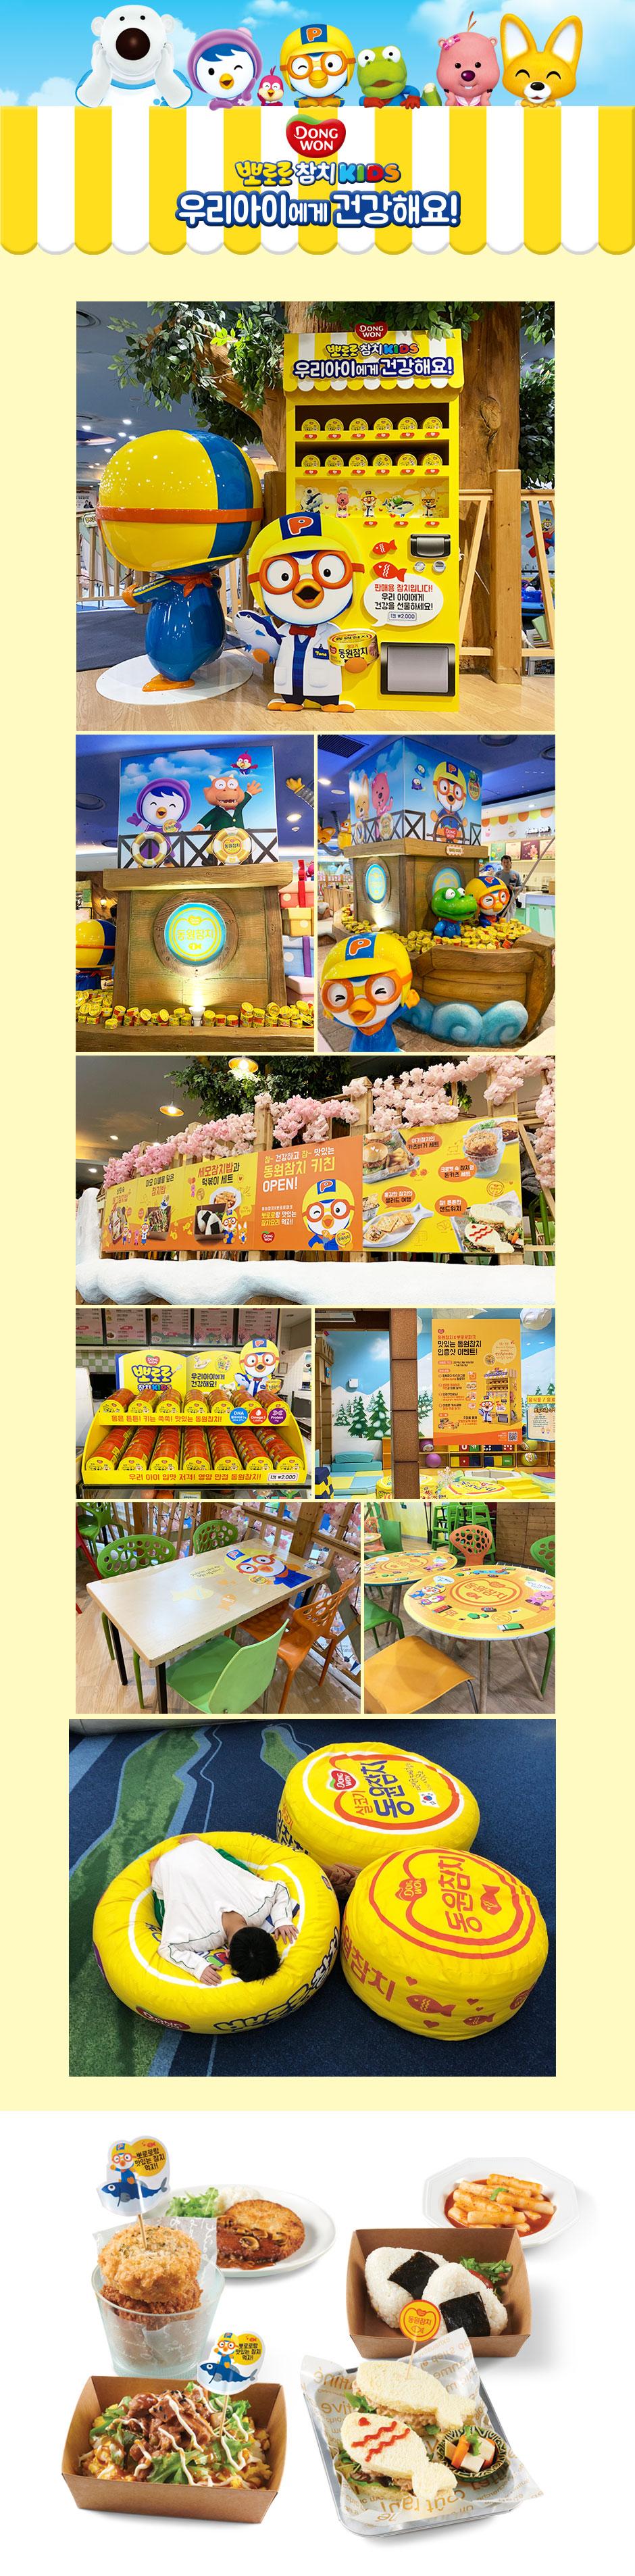 2019_Dongwon-FnB_pororo-park-_new